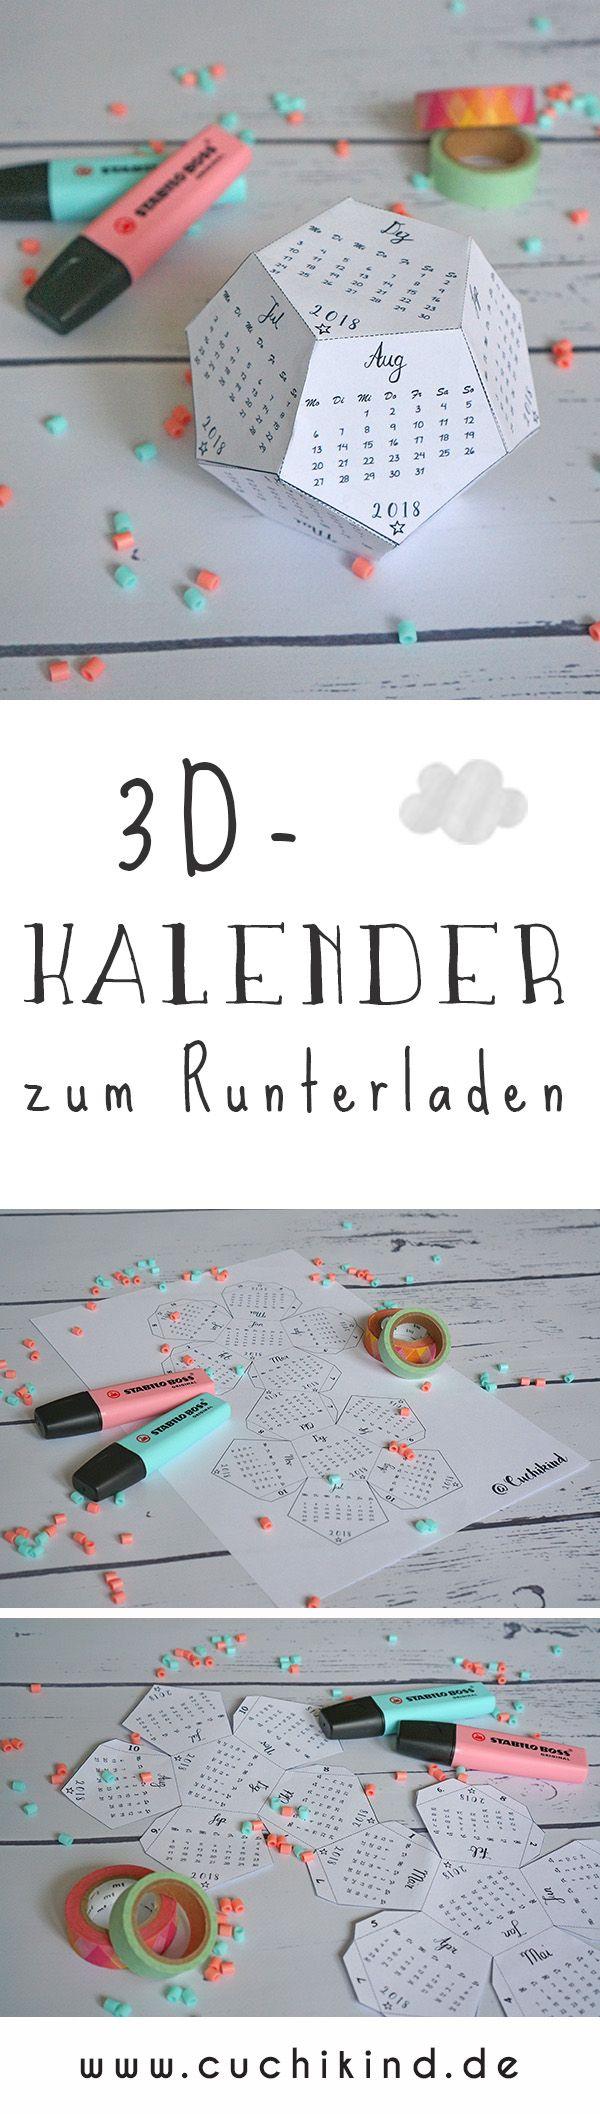 3D-Kalender 2018 (Free Printable